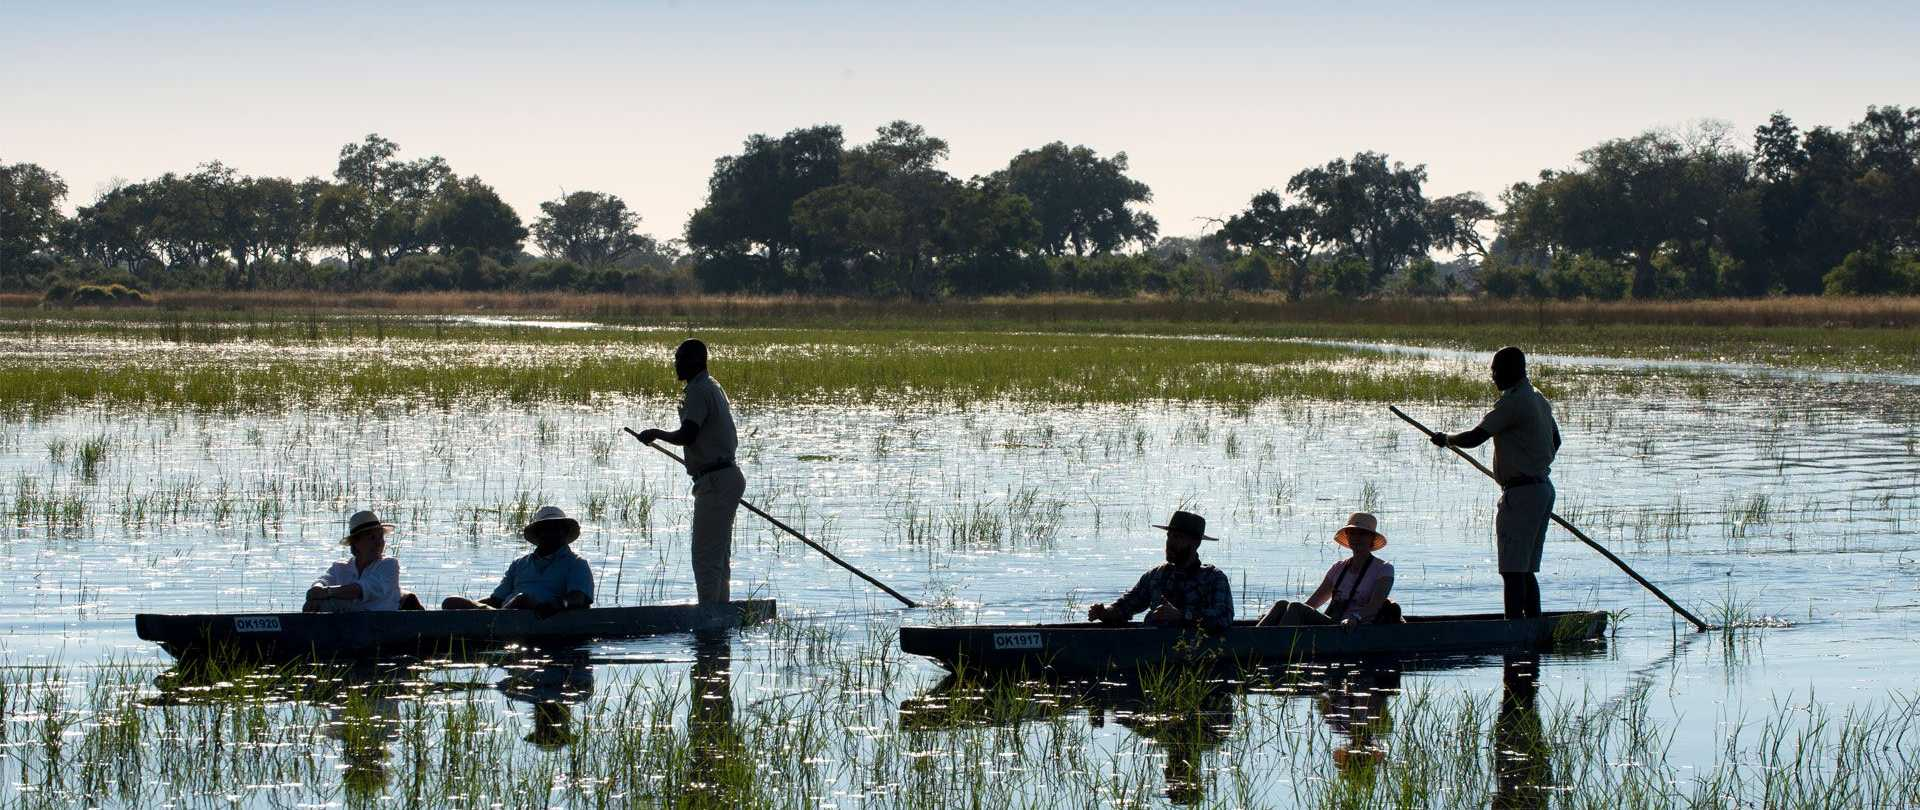 andBeyond Xaranna Okavango Delta Camp.